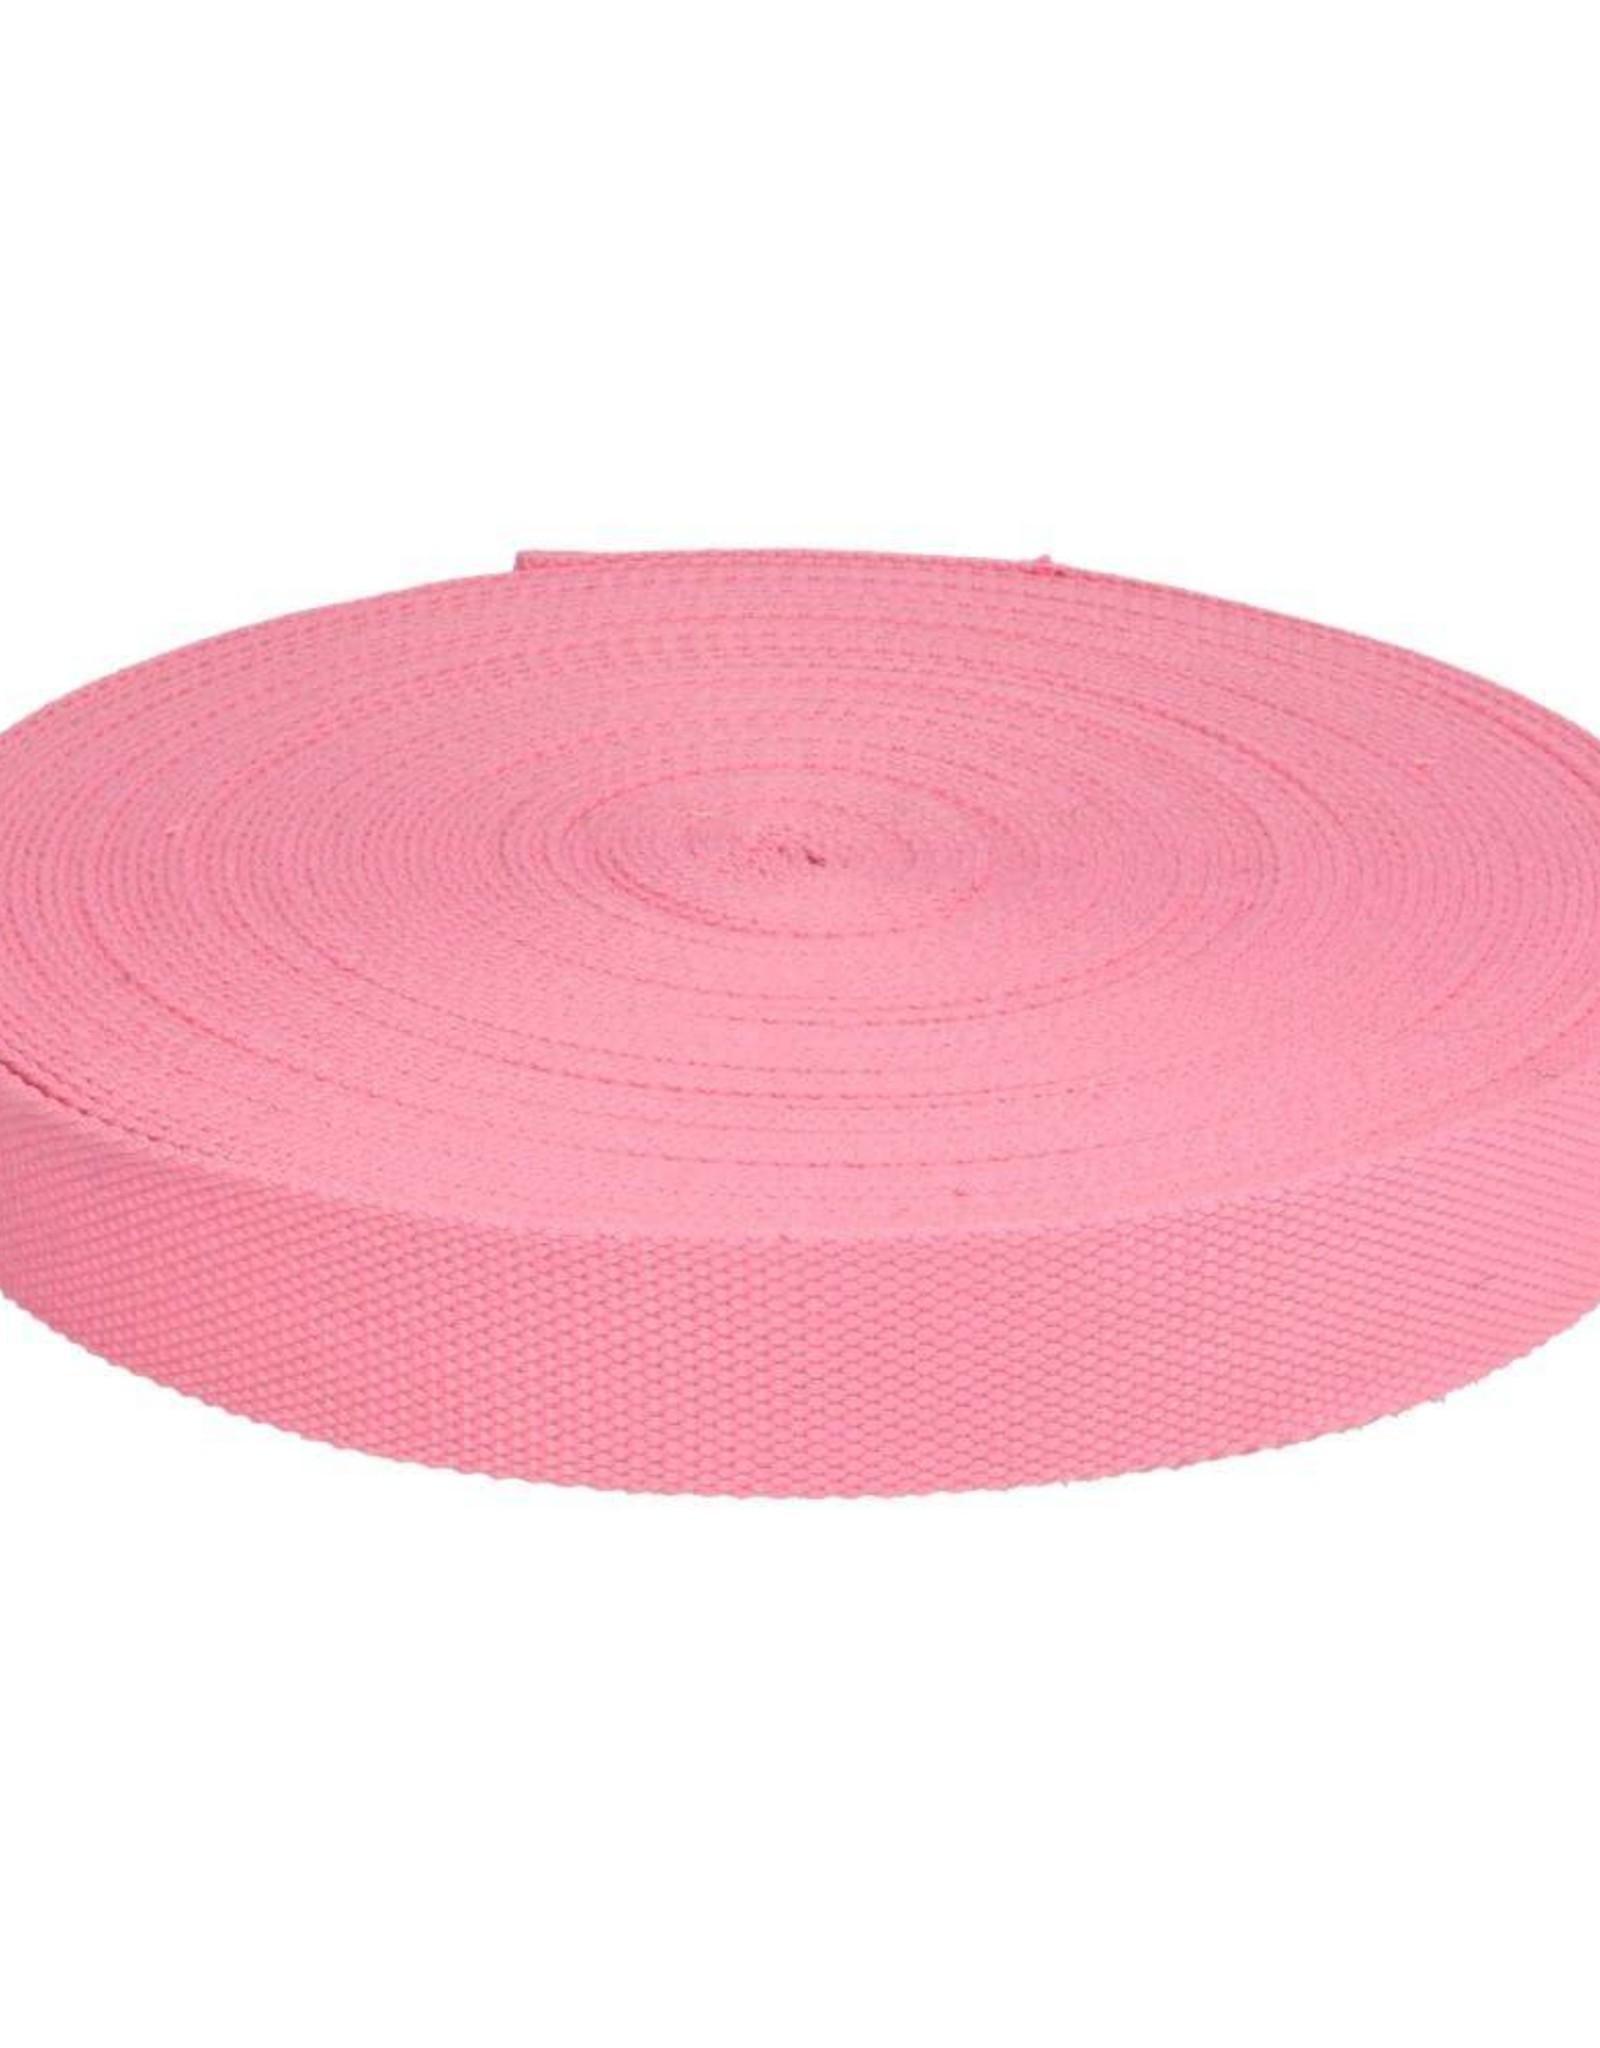 Tassenband - Rose